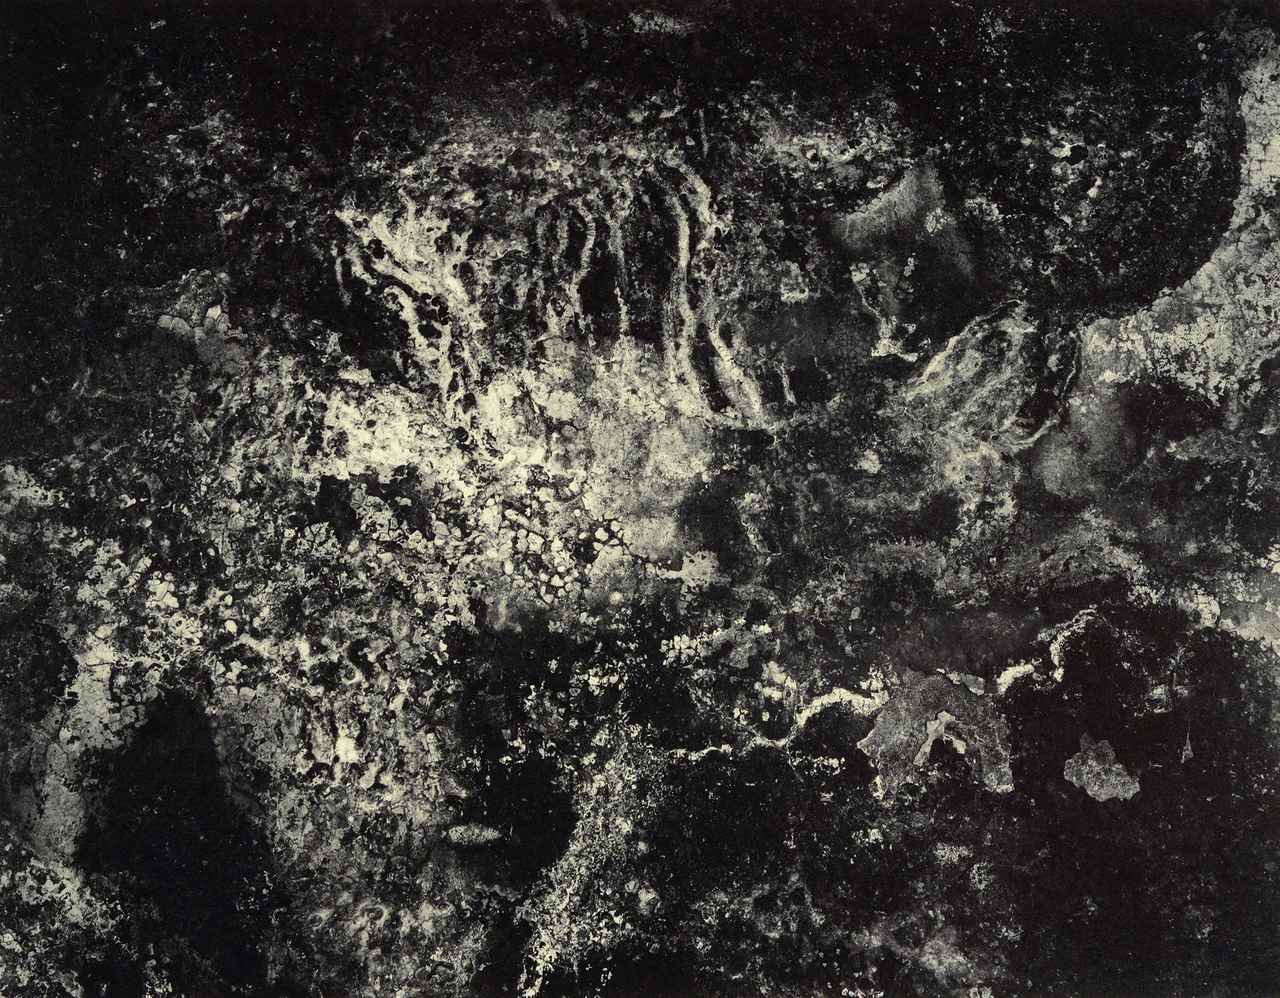 画像3: 展示作品より©️川田喜久治